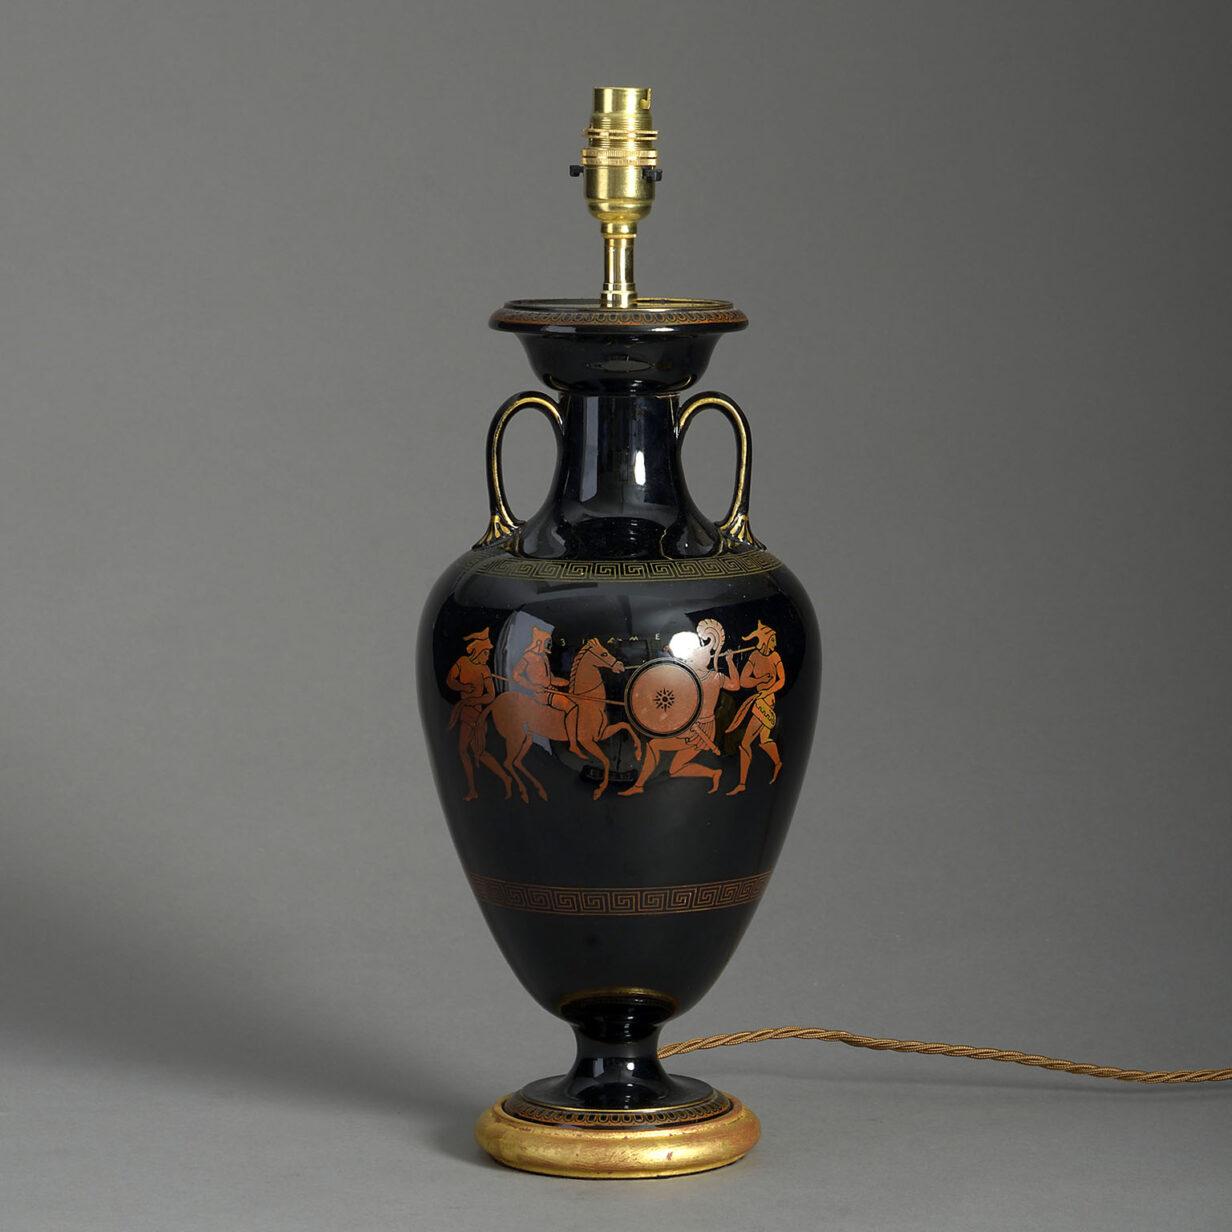 Etruscan Revival Vase lamp